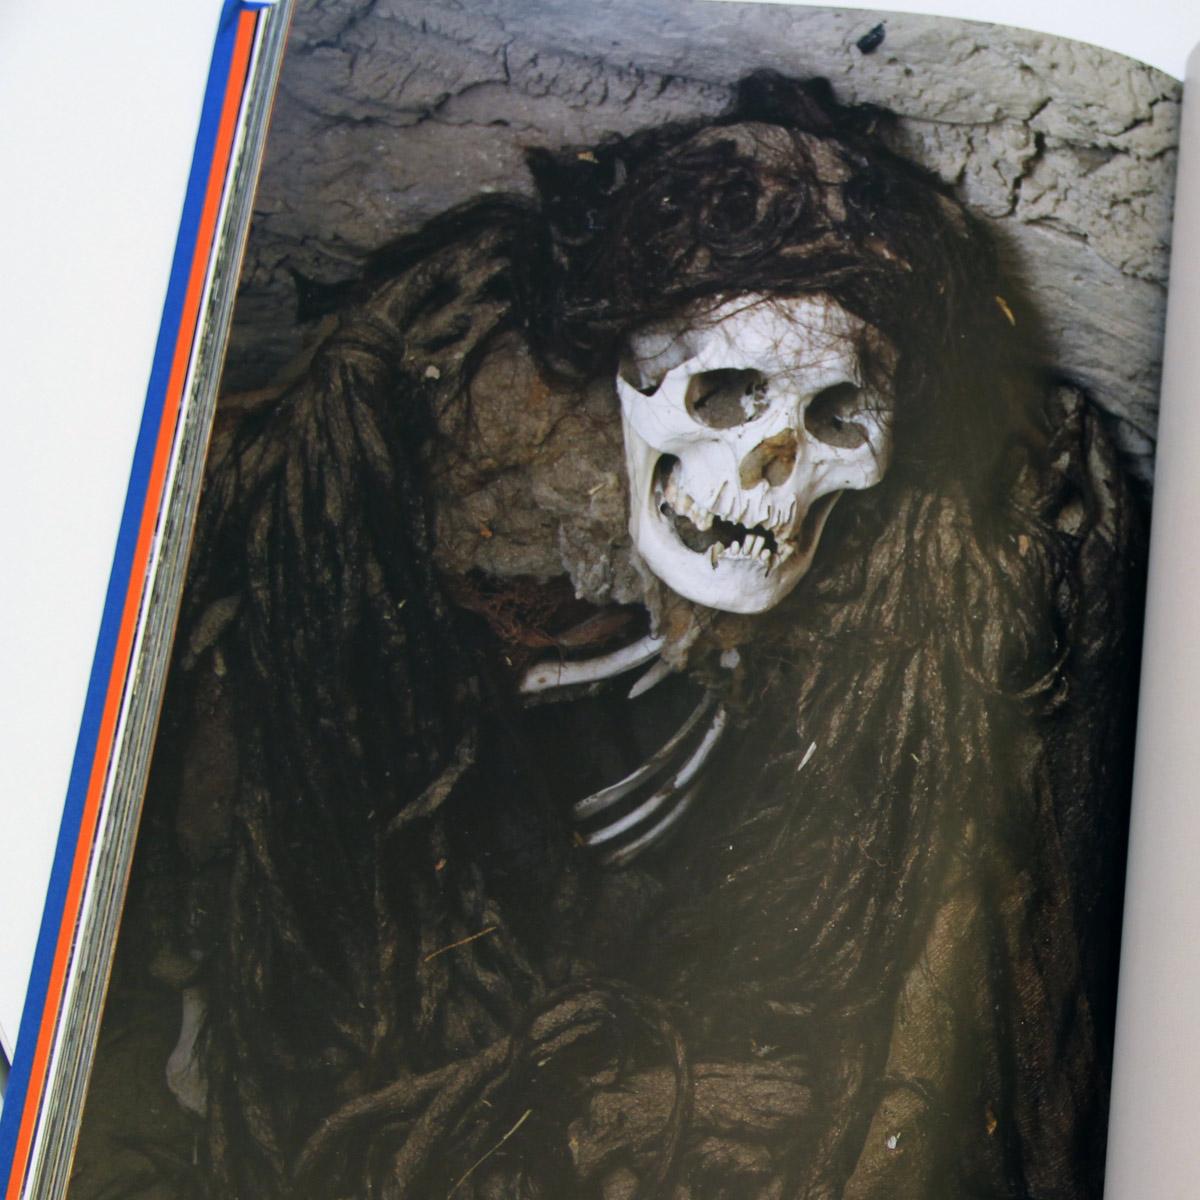 Paul Koudounaris: Memento Mori